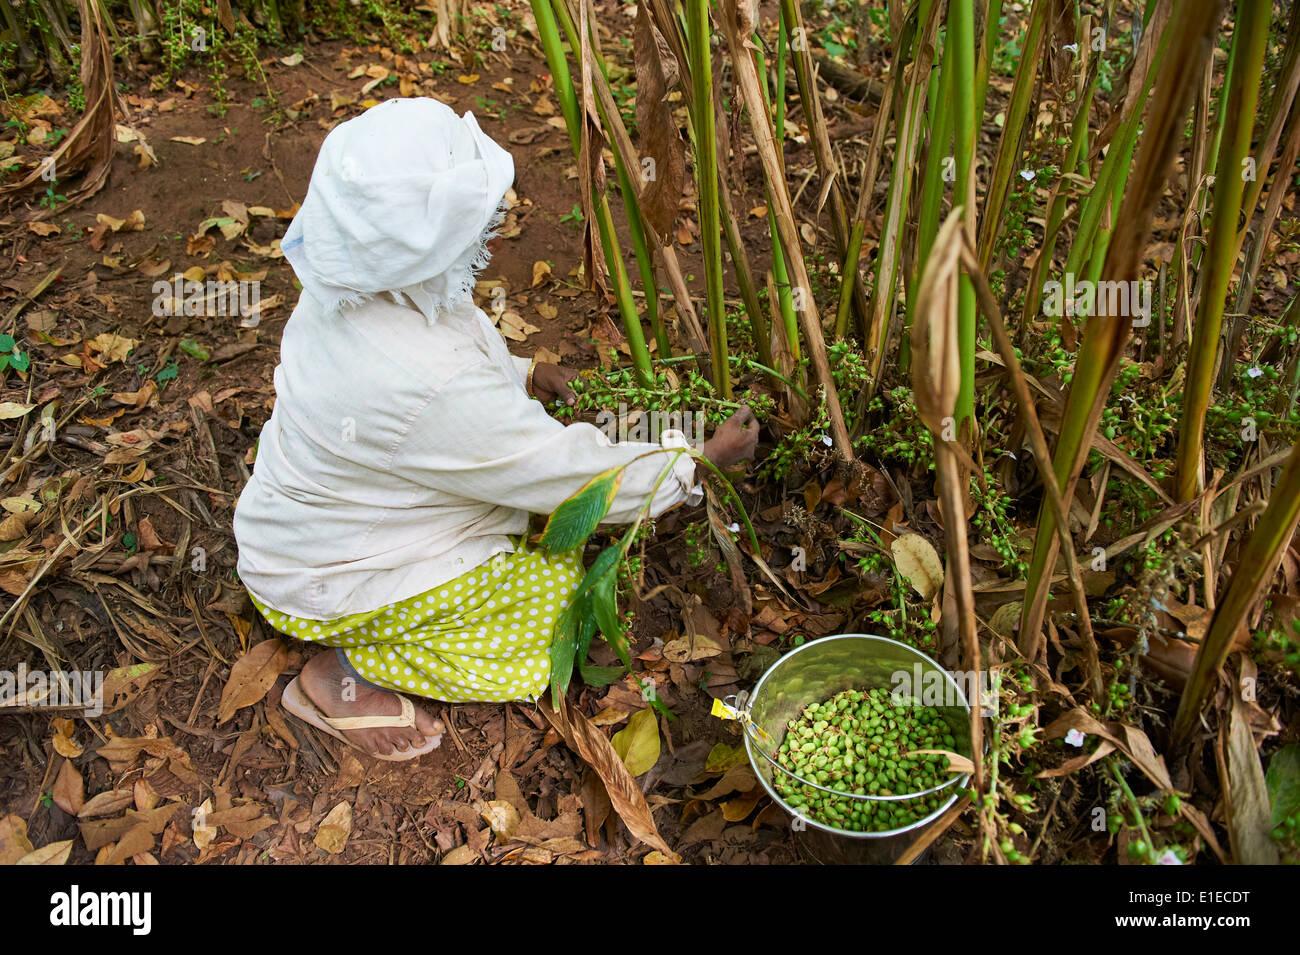 India, Kerala state, Munnar, collect of cardamom - Stock Image